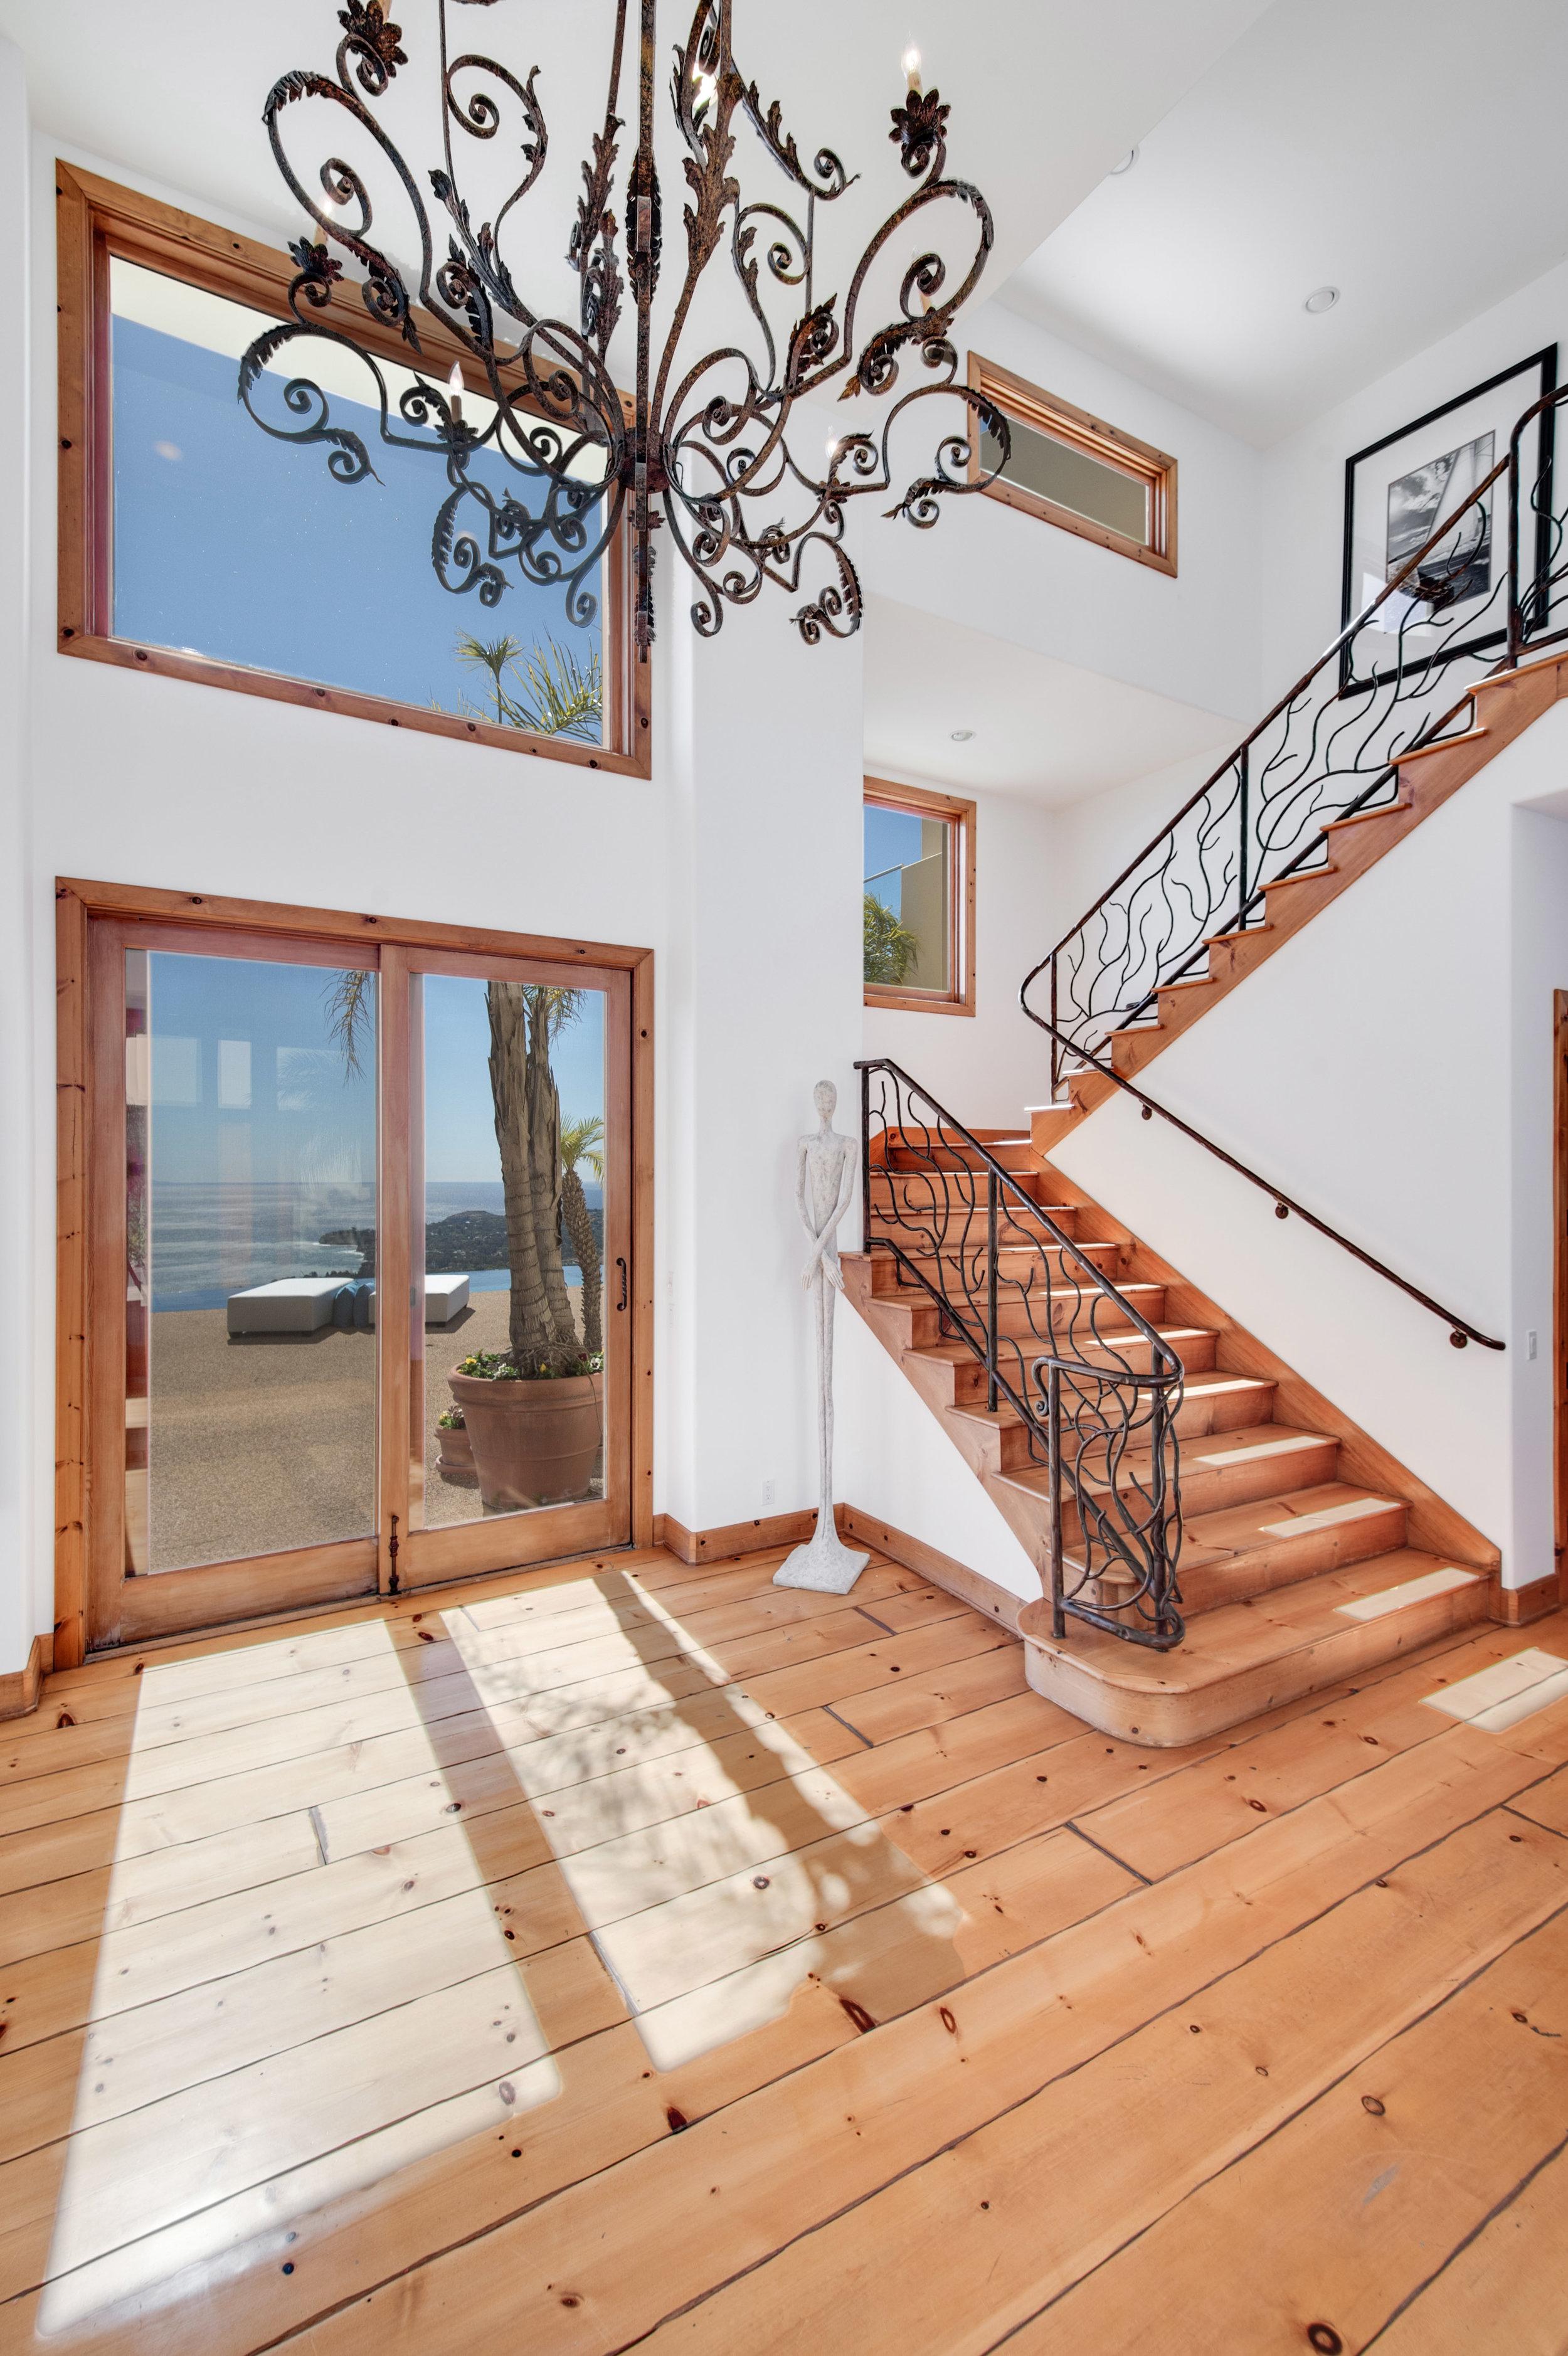 012 Stairs 27475 Latigo Bay View Drive For Sale Lease The Malibu Life Team Luxury Real Estate.jpg